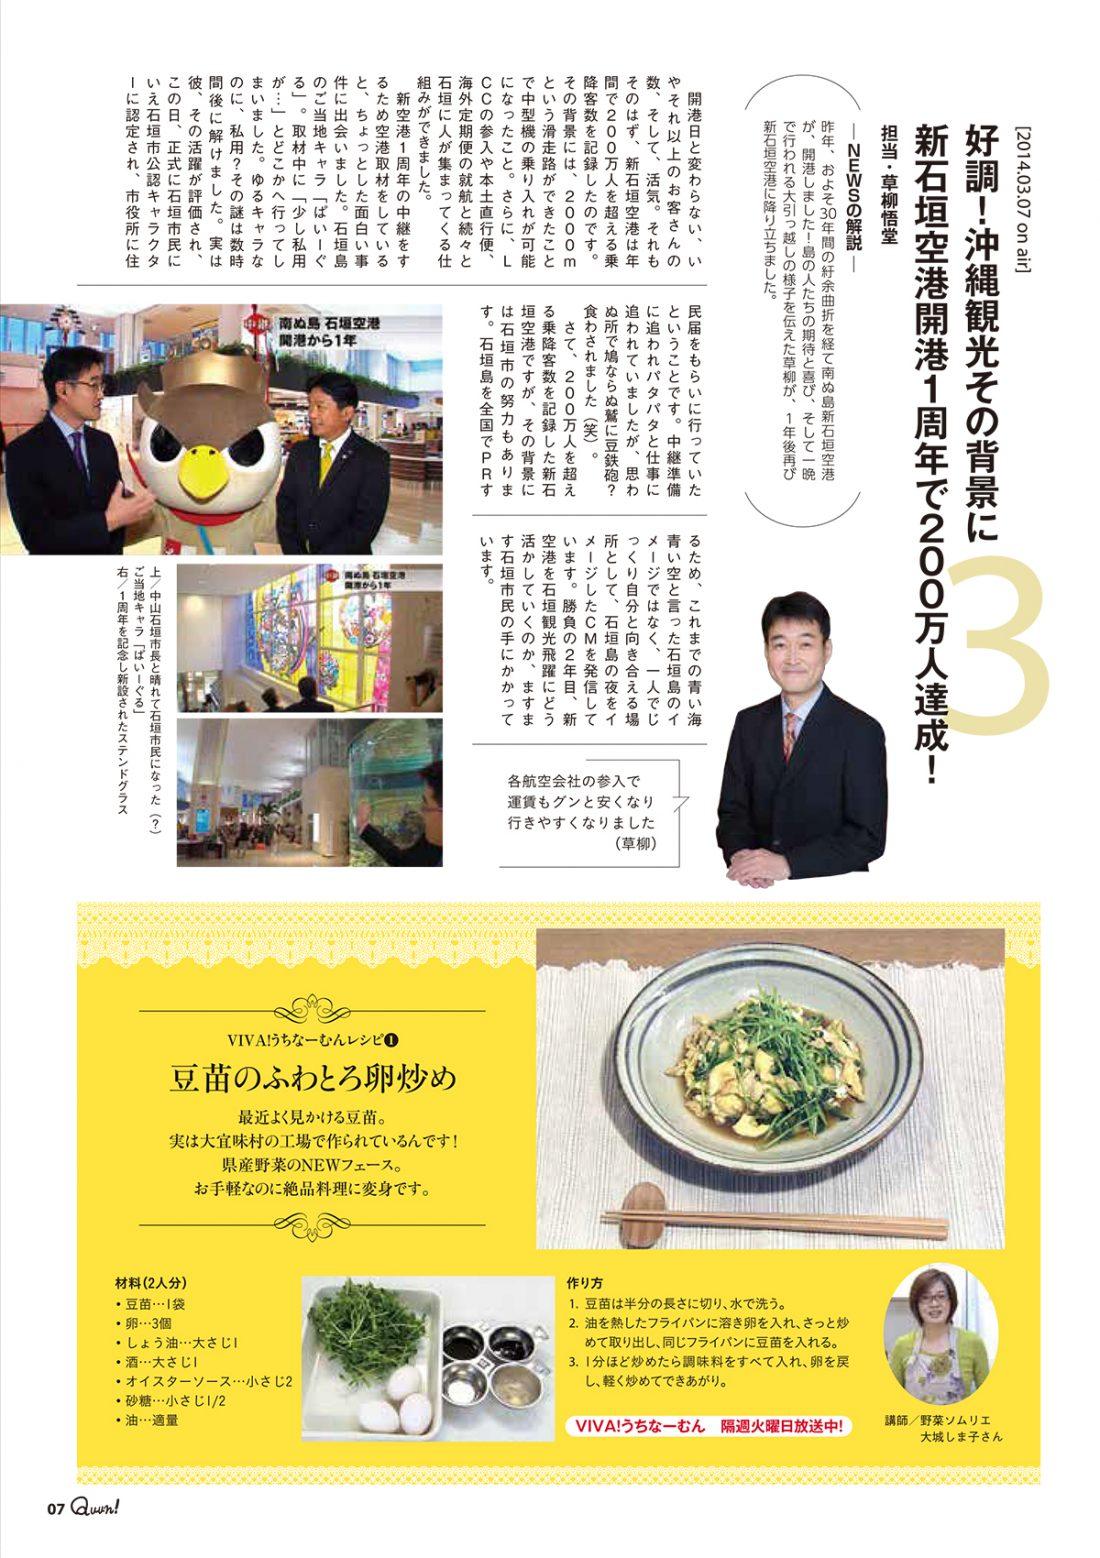 http://www.qab.co.jp/qgoro/wp-content/uploads/quun_0109-1100x1558.jpg